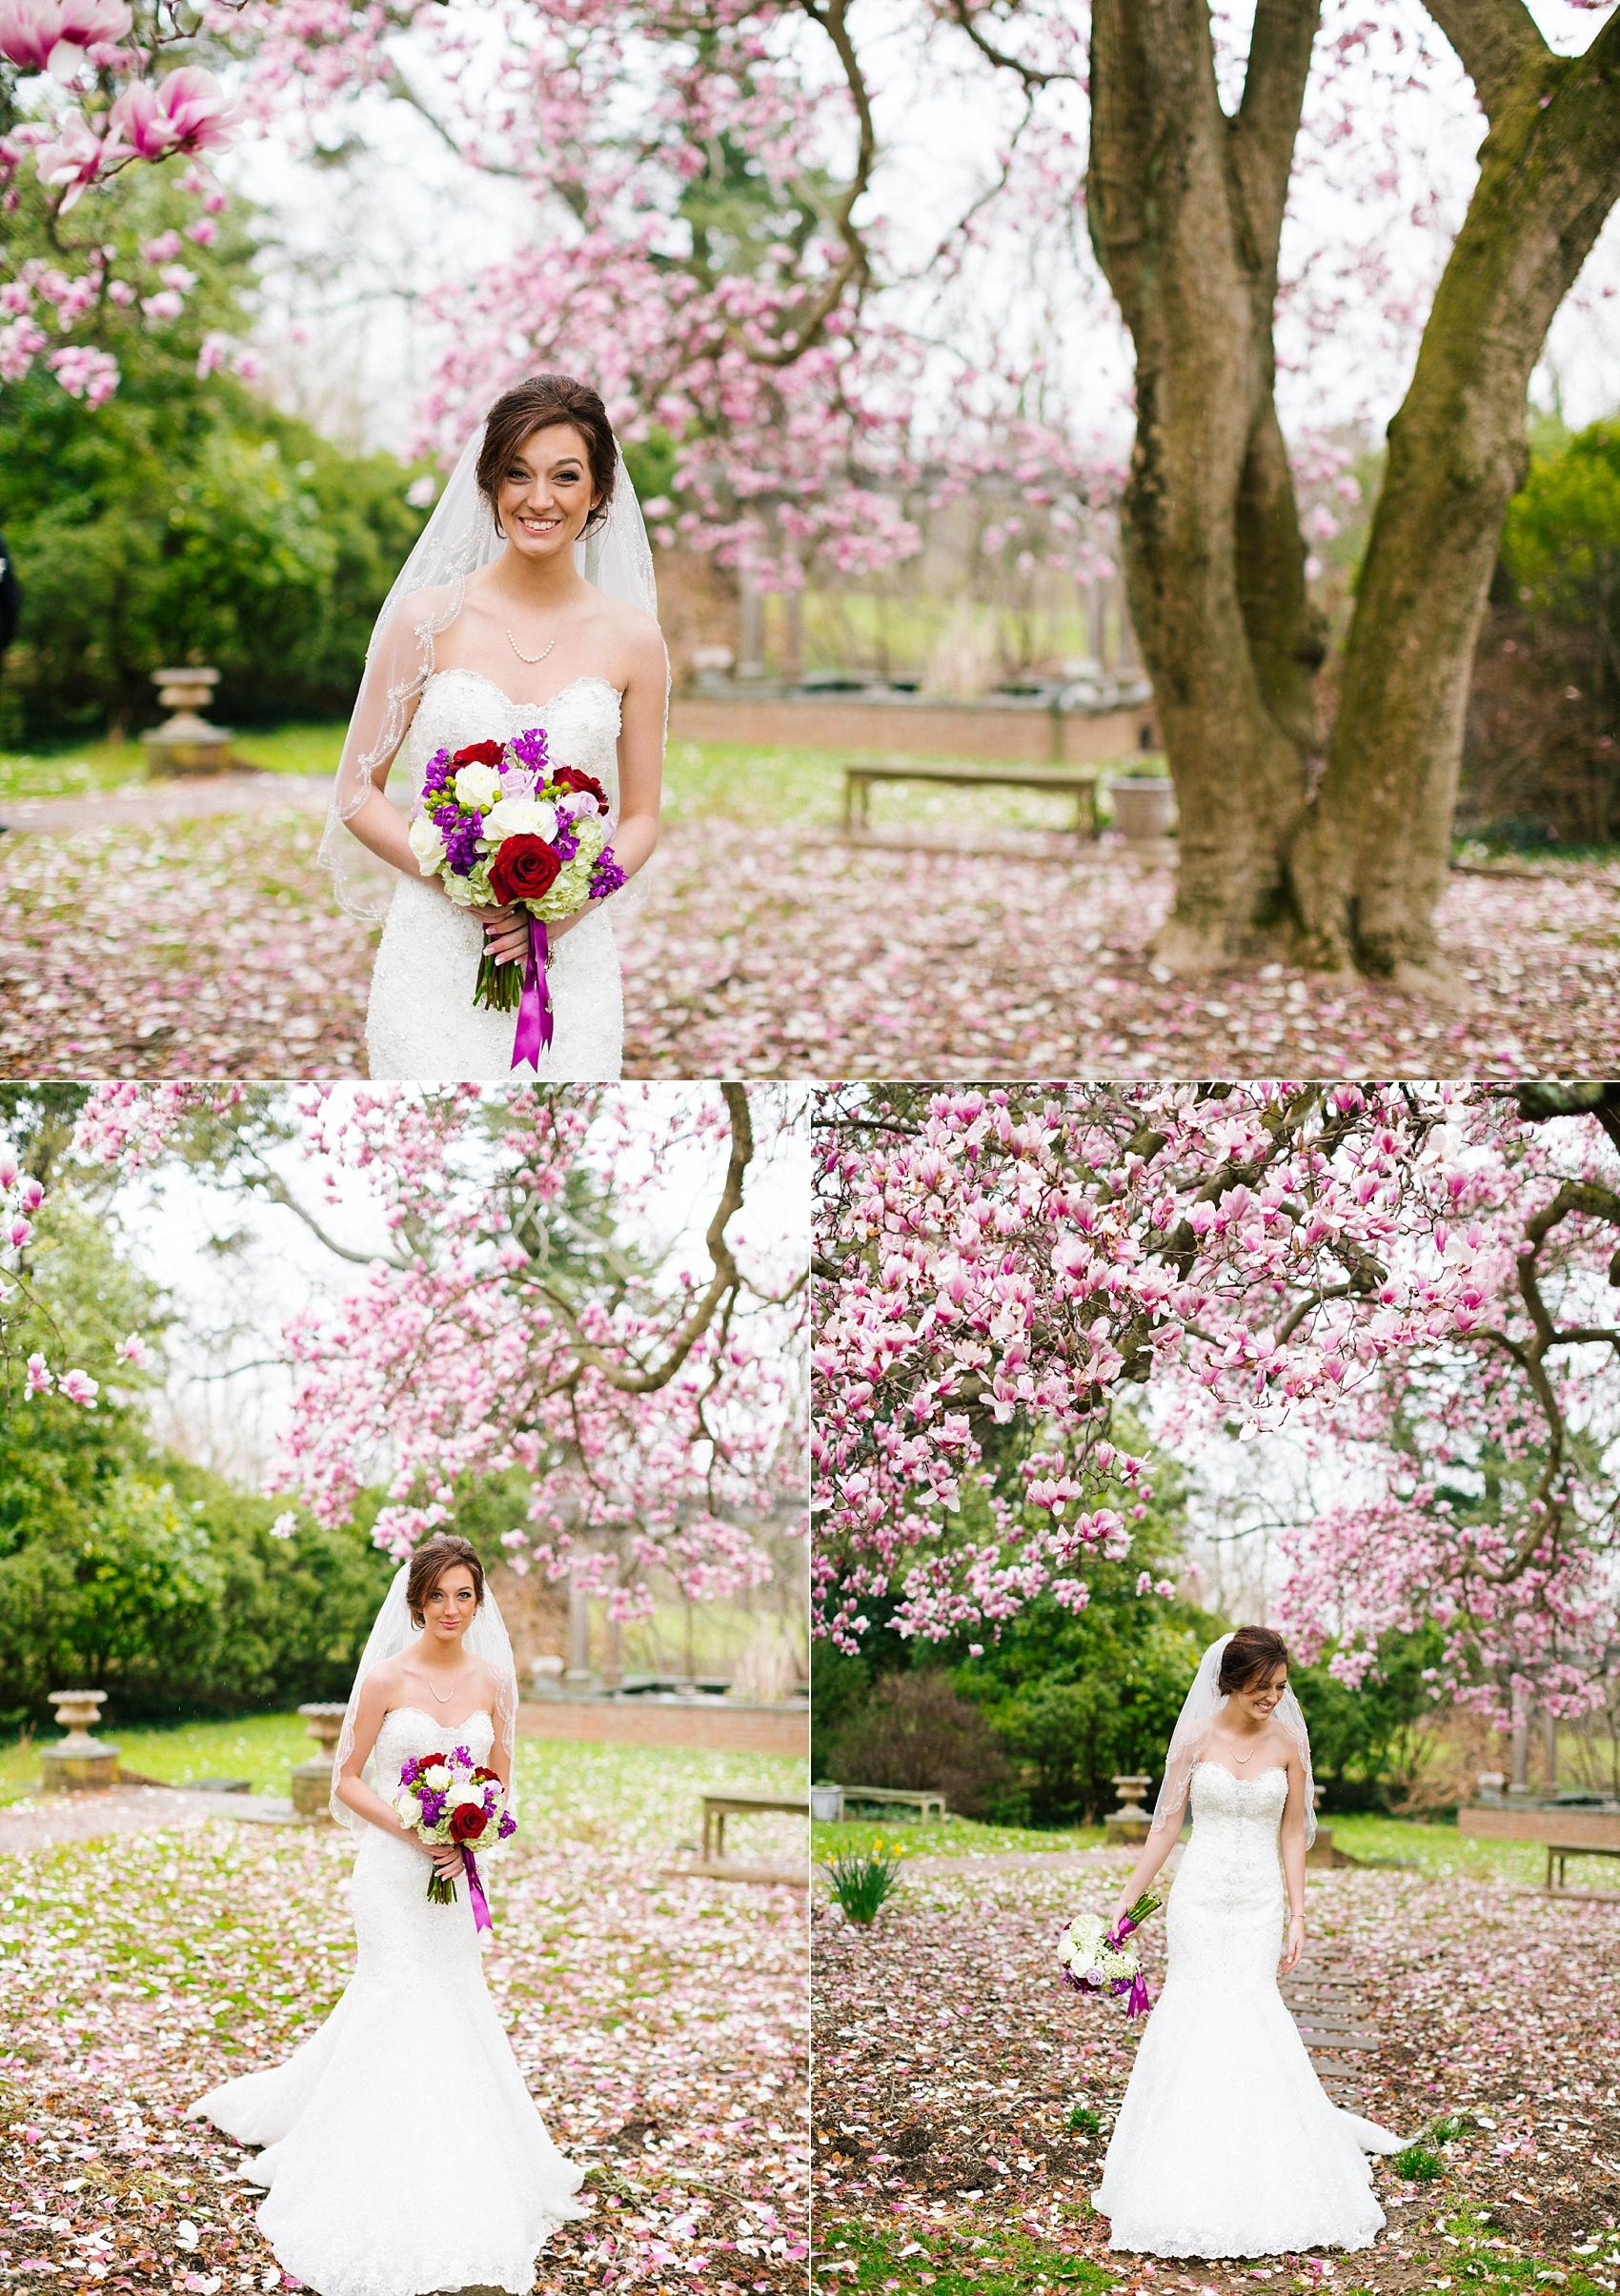 dwayne lydia delaware wedding philadelphia baltimore washingtion dc wedding photographer-21